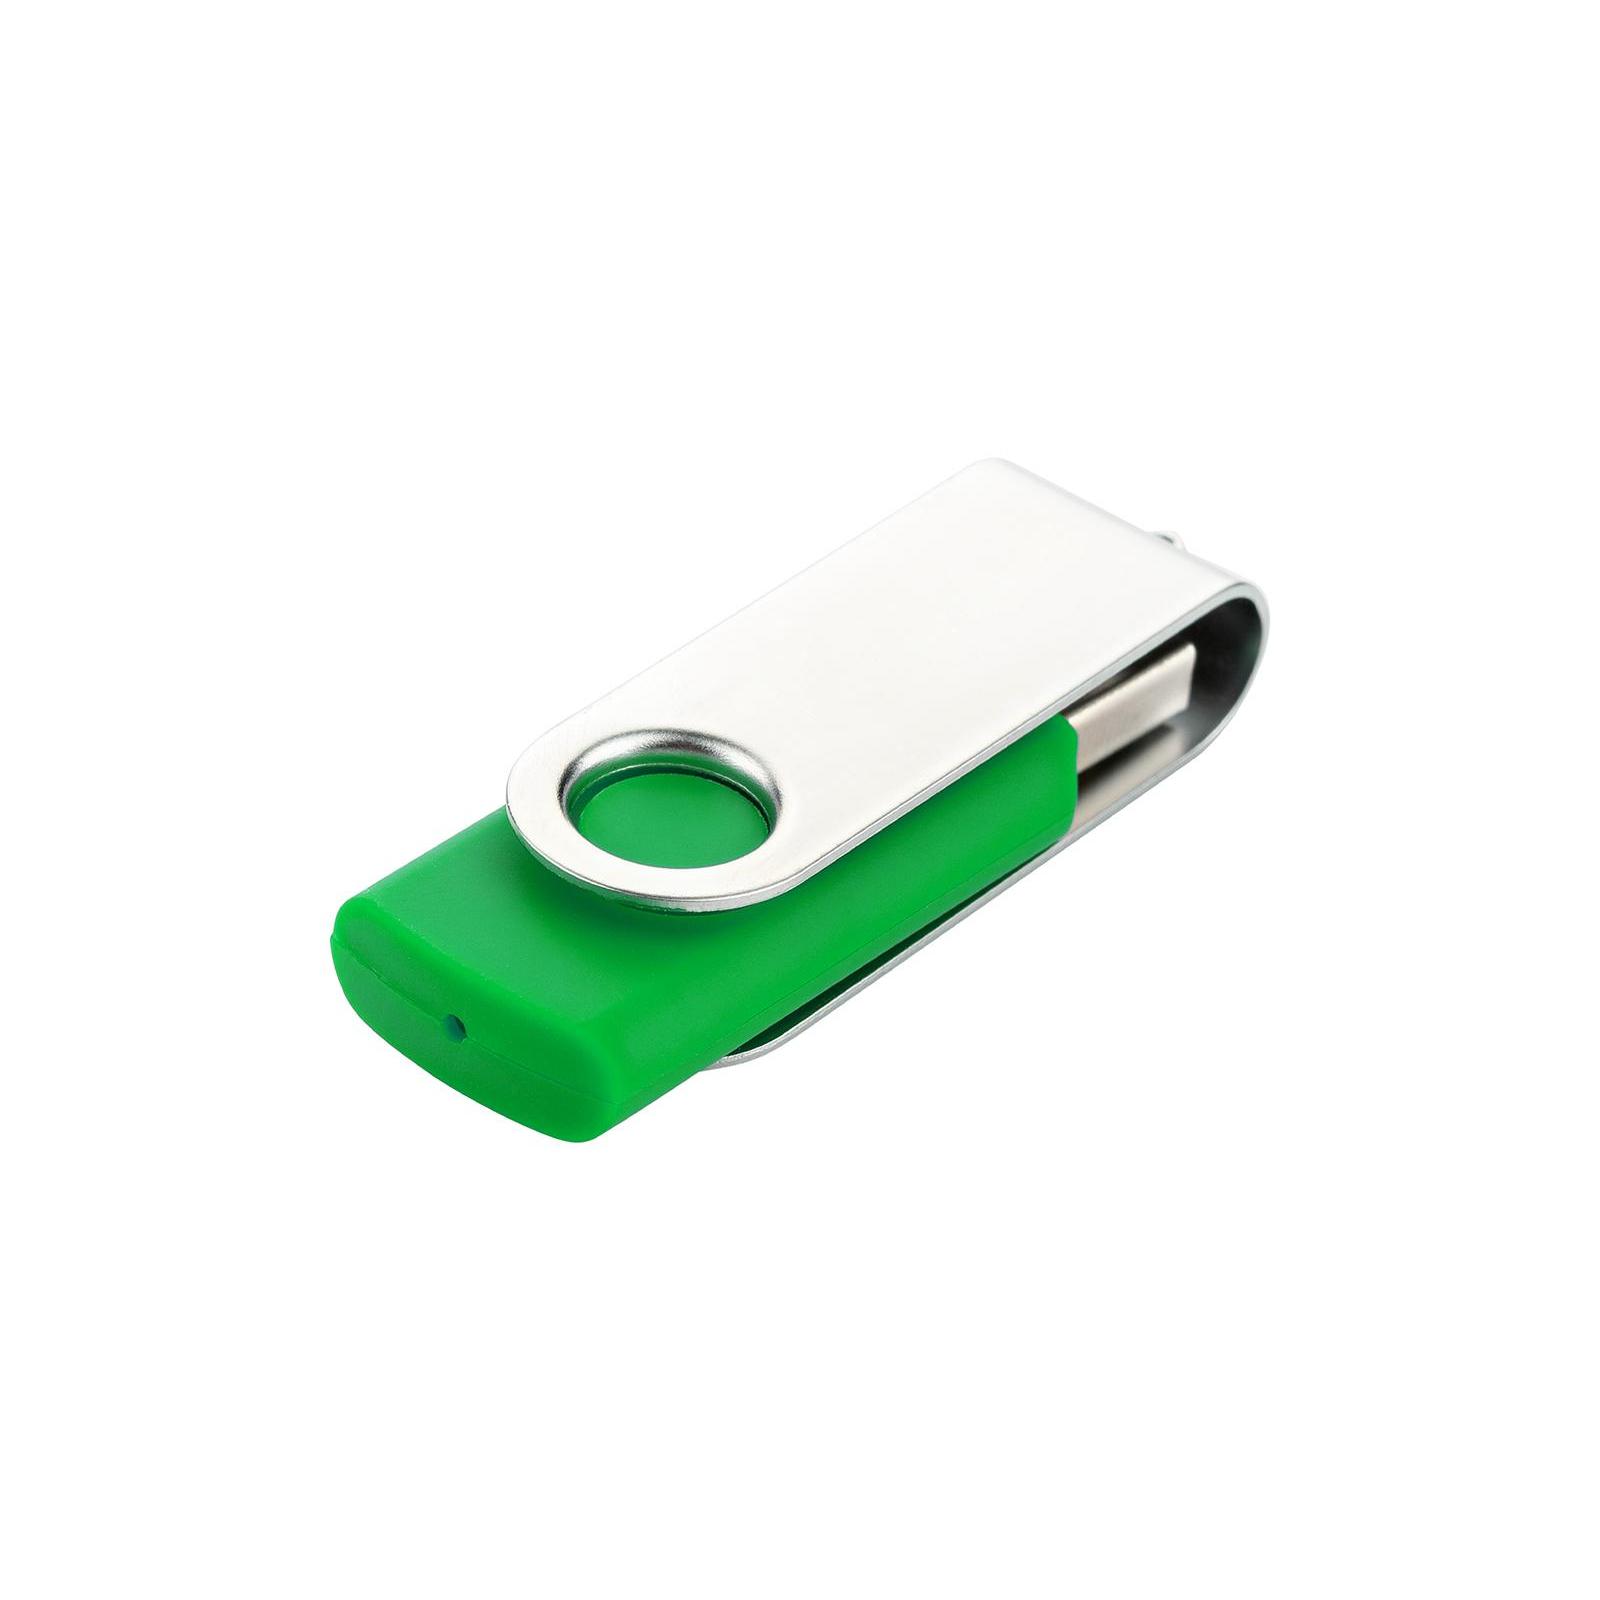 USB флеш накопитель eXceleram 8GB P1 Series Silver/Purple USB 2.0 (EXP1U2SIPU08) изображение 6